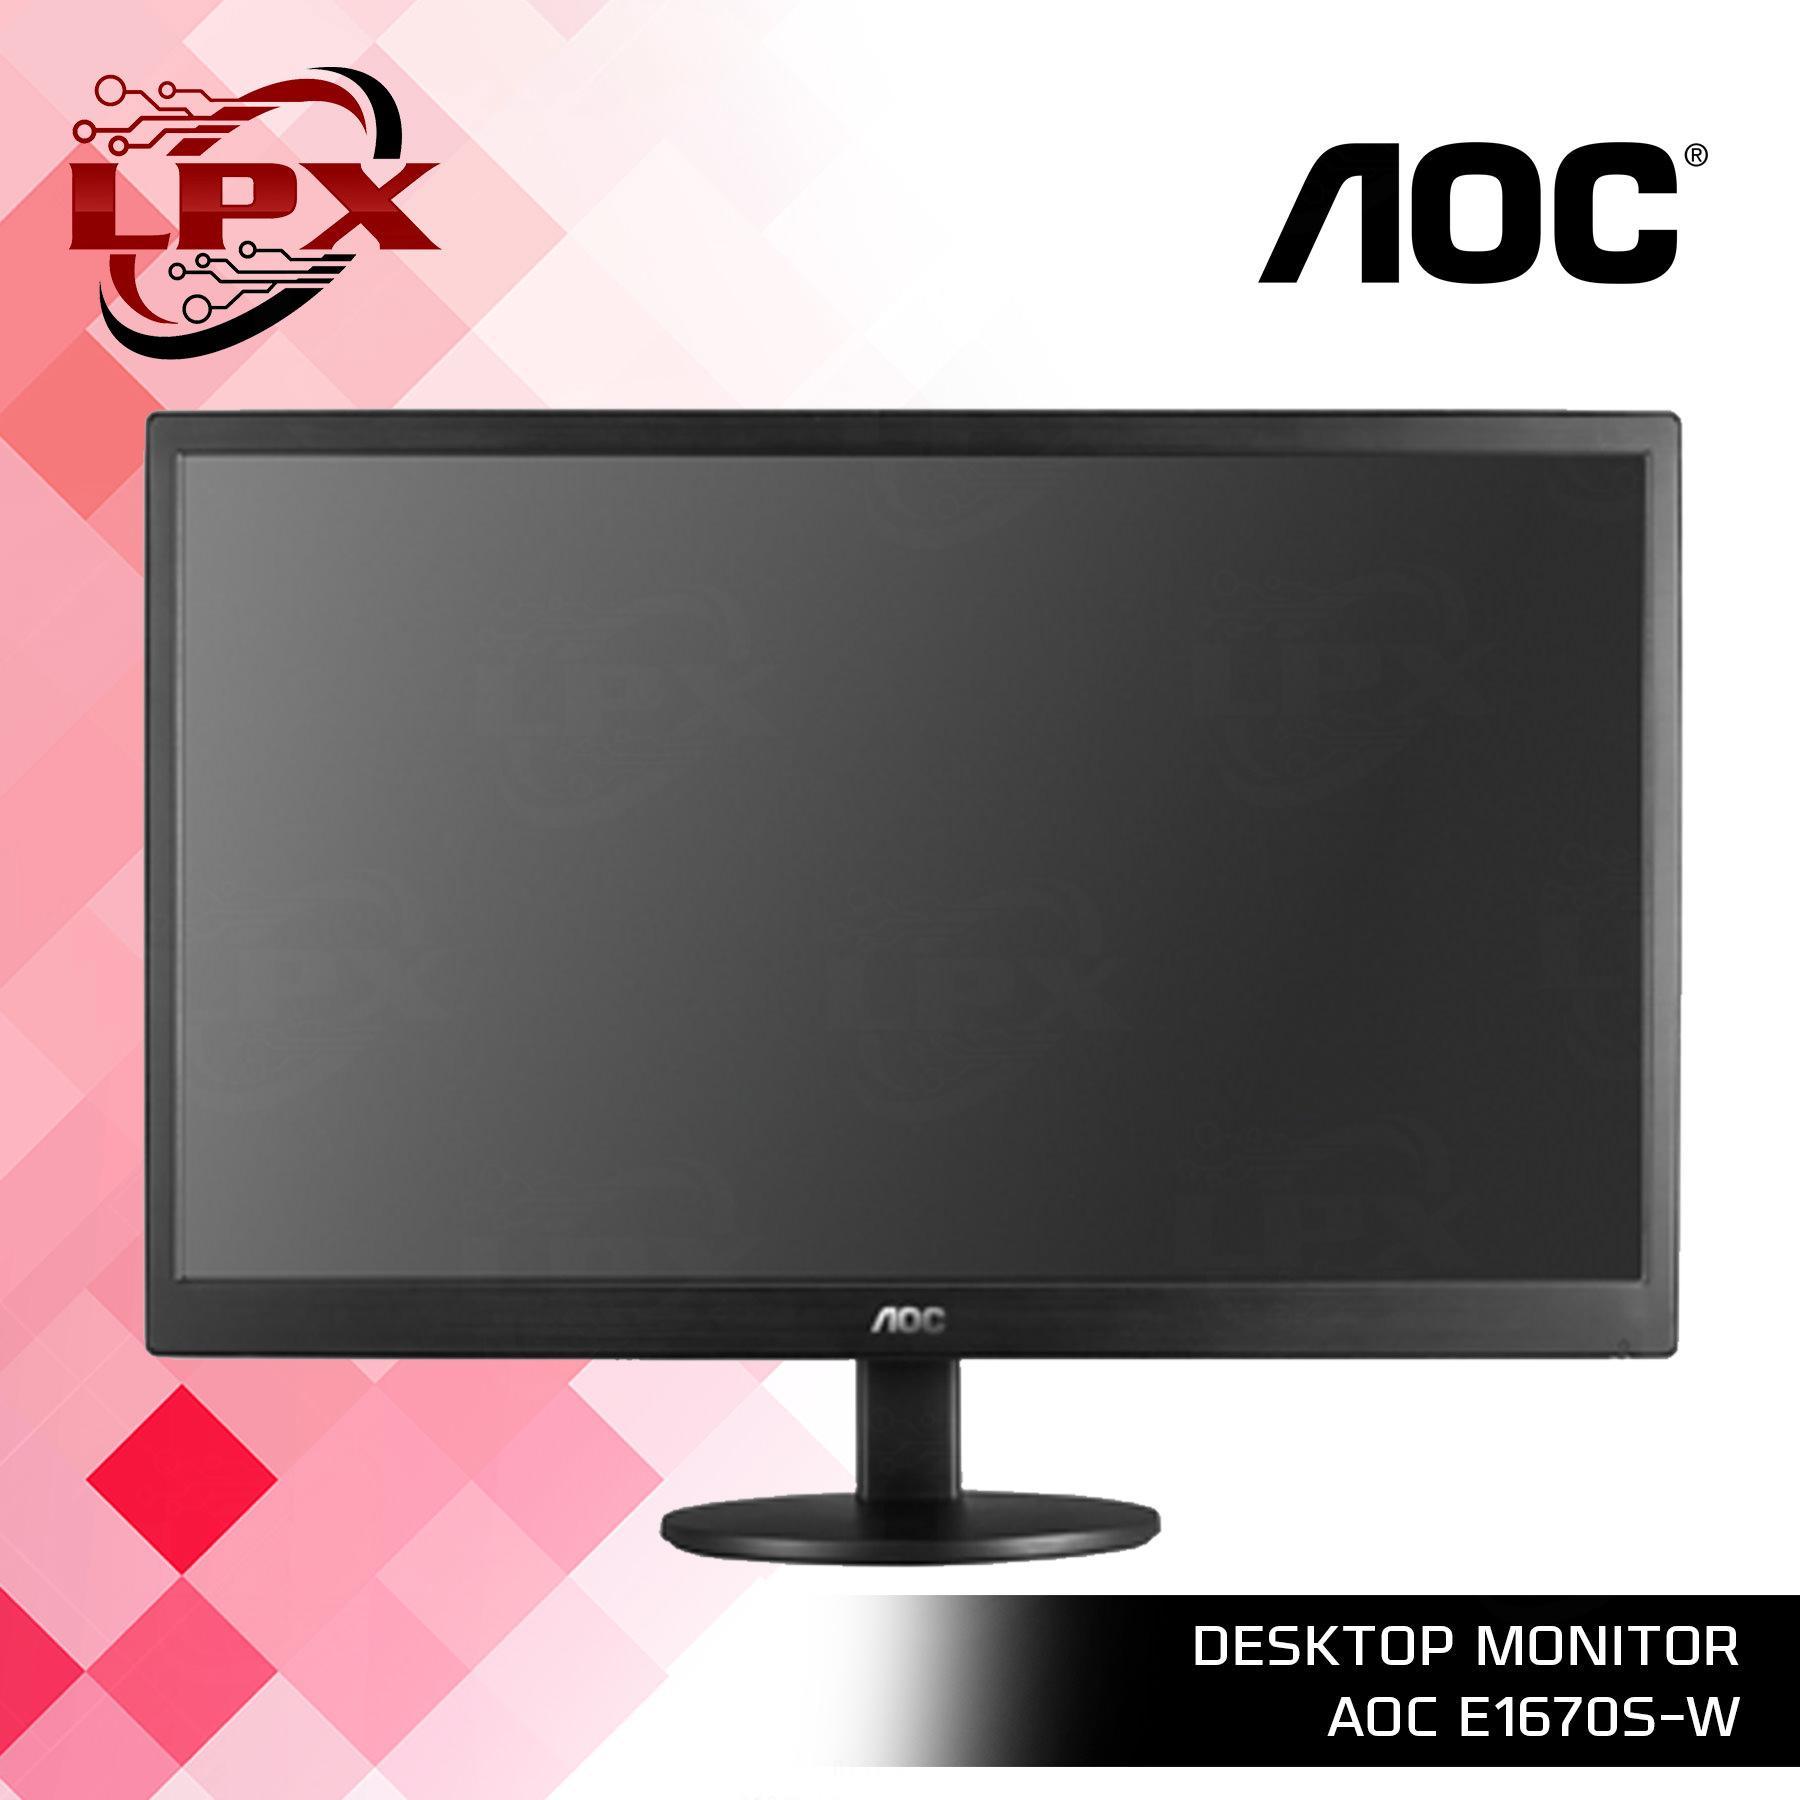 LED Monitor AoC E1670sw 15 6' Desktop Monitor